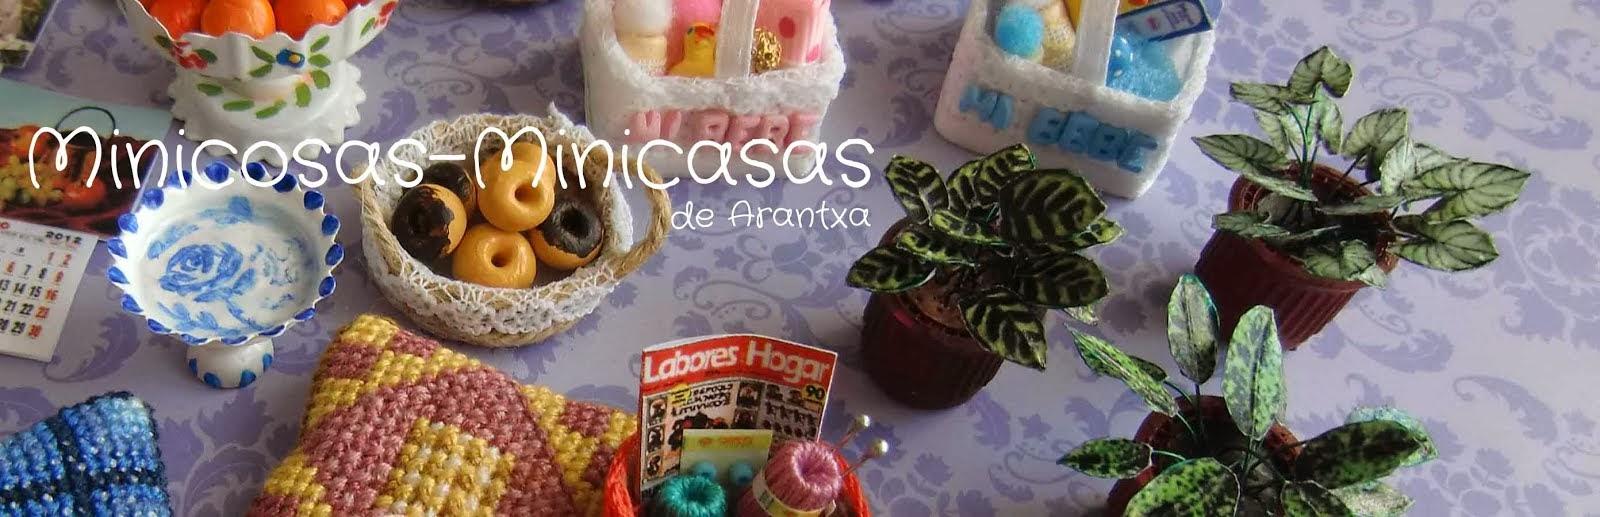 Minicosas-Minicasas